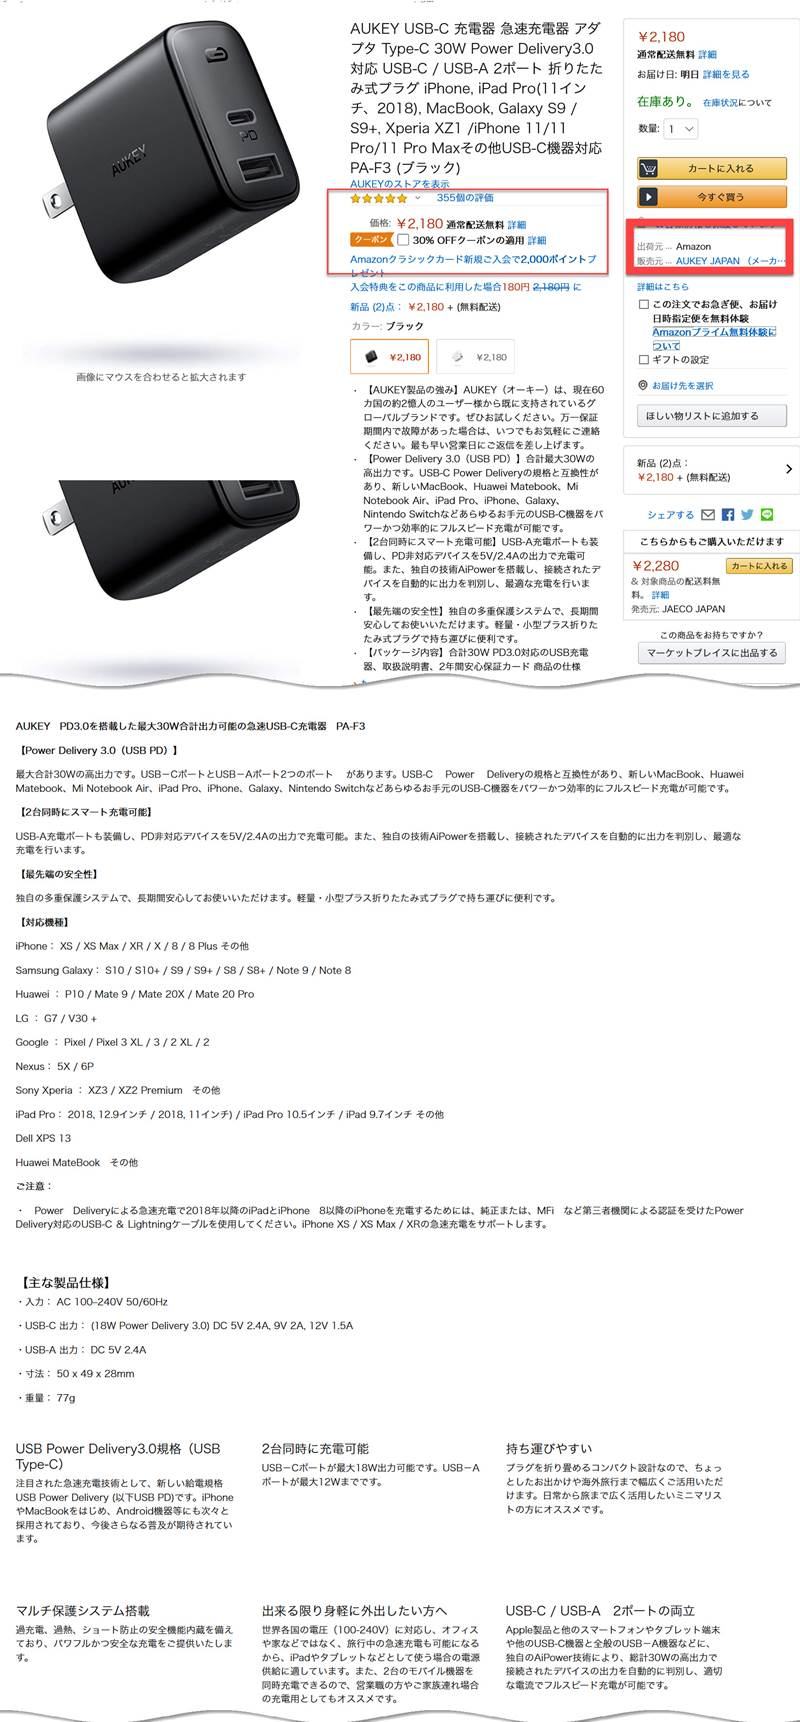 AUKEY USB-C 充電器 急速充電器 Type-C 30W PD3.0対応 が約1,500円!